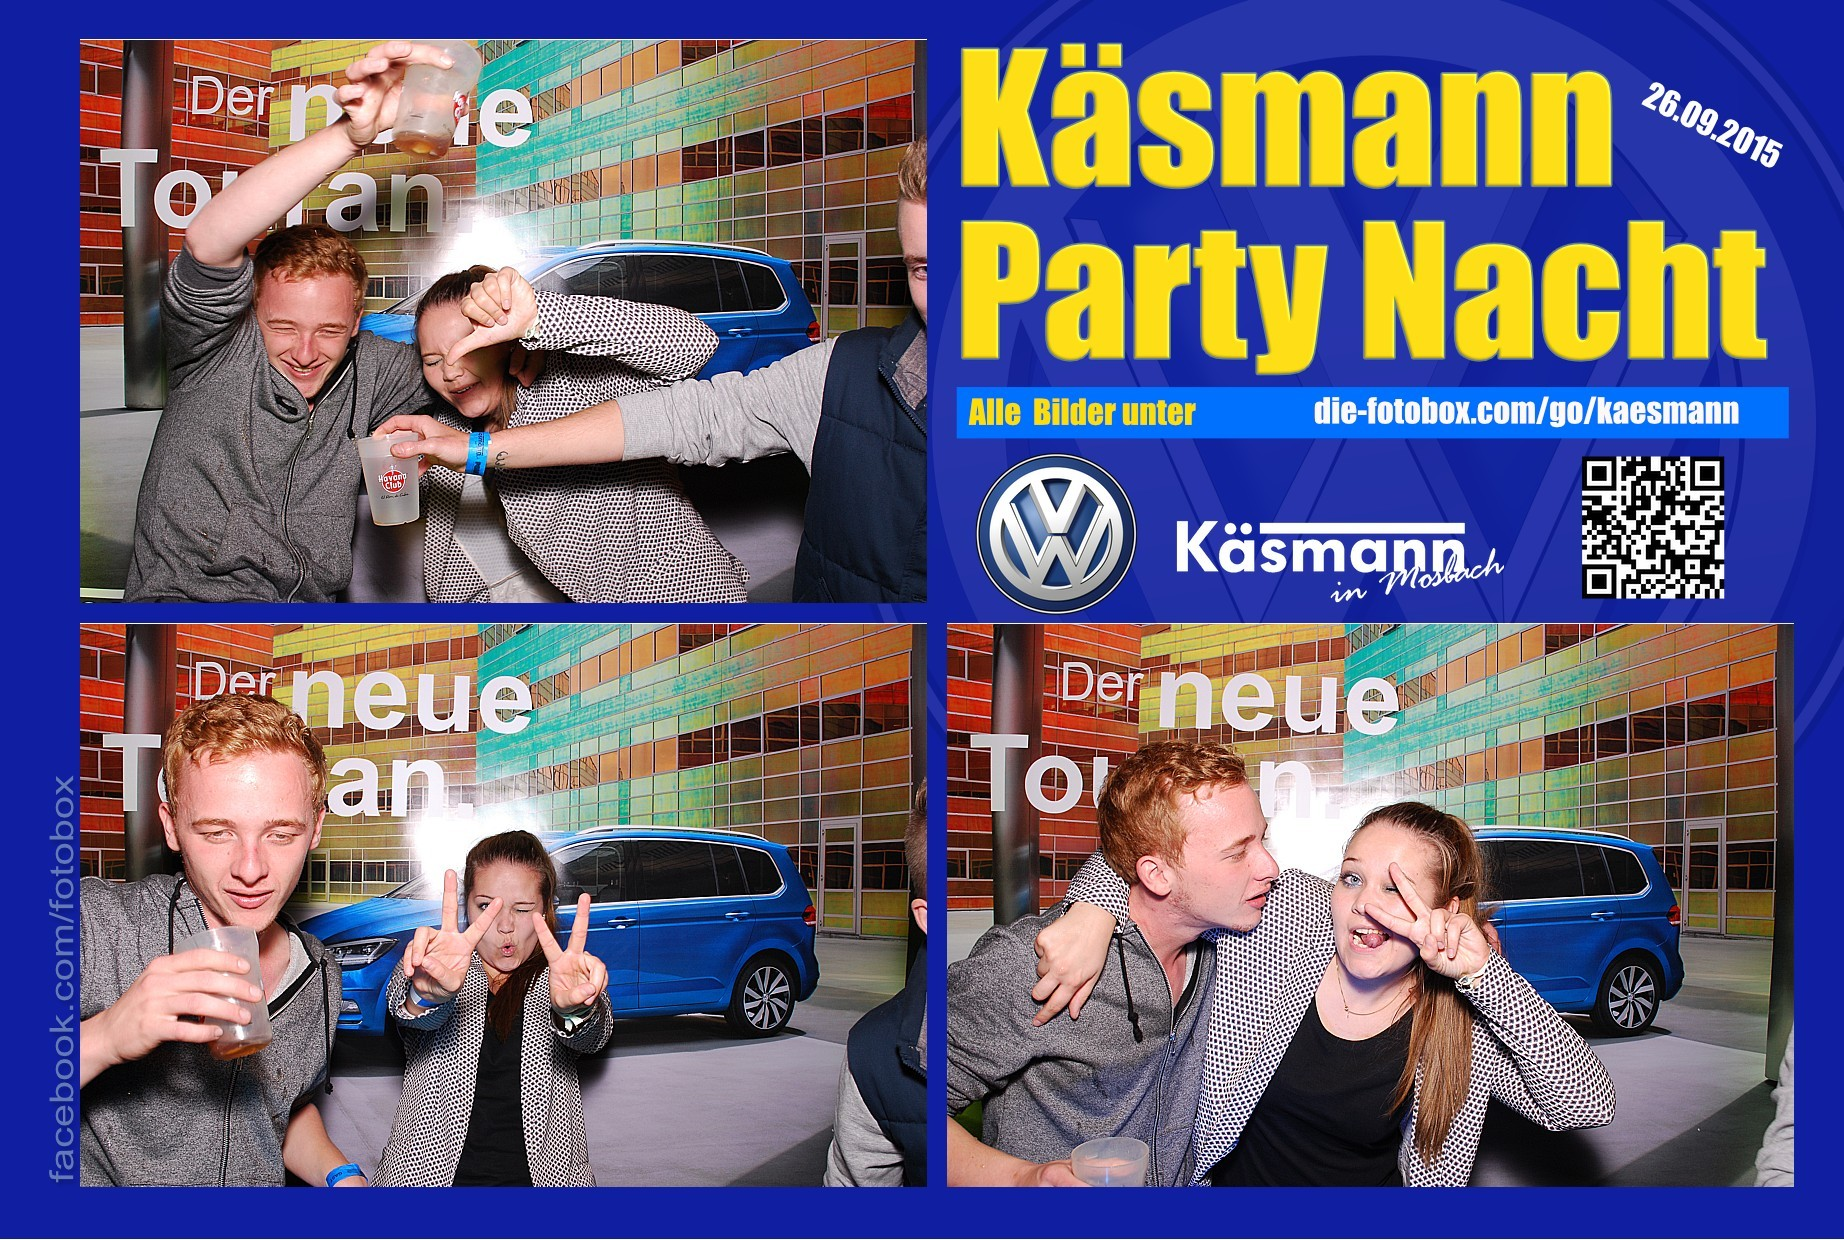 Käsmannparty 2015 - www.die-fotobox.com 01387